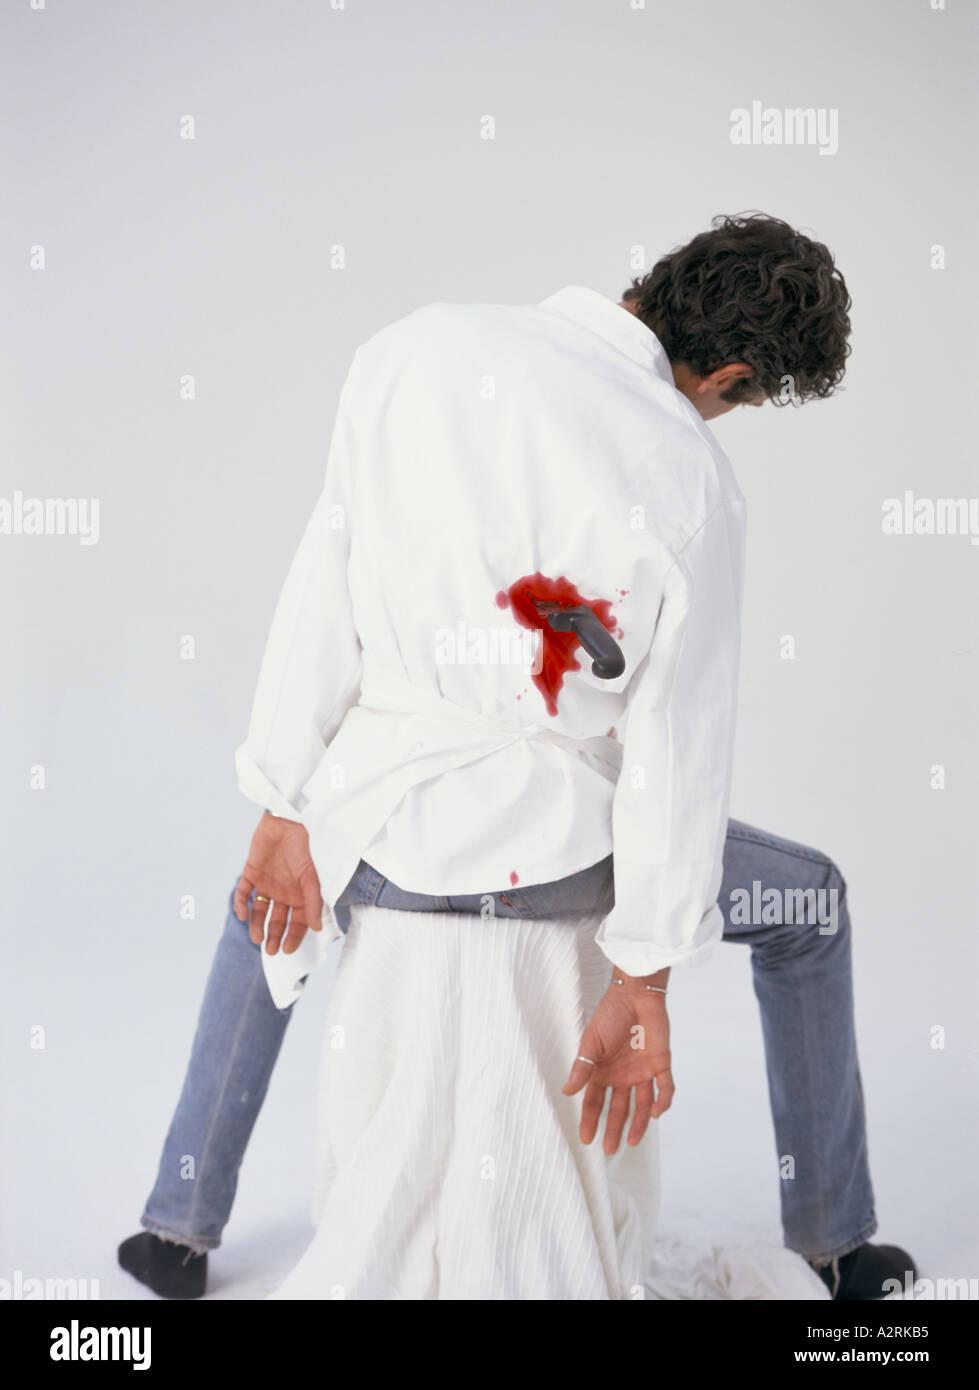 Anthony Bourdain Stock Photos & Anthony Bourdain Stock Images - Alamy